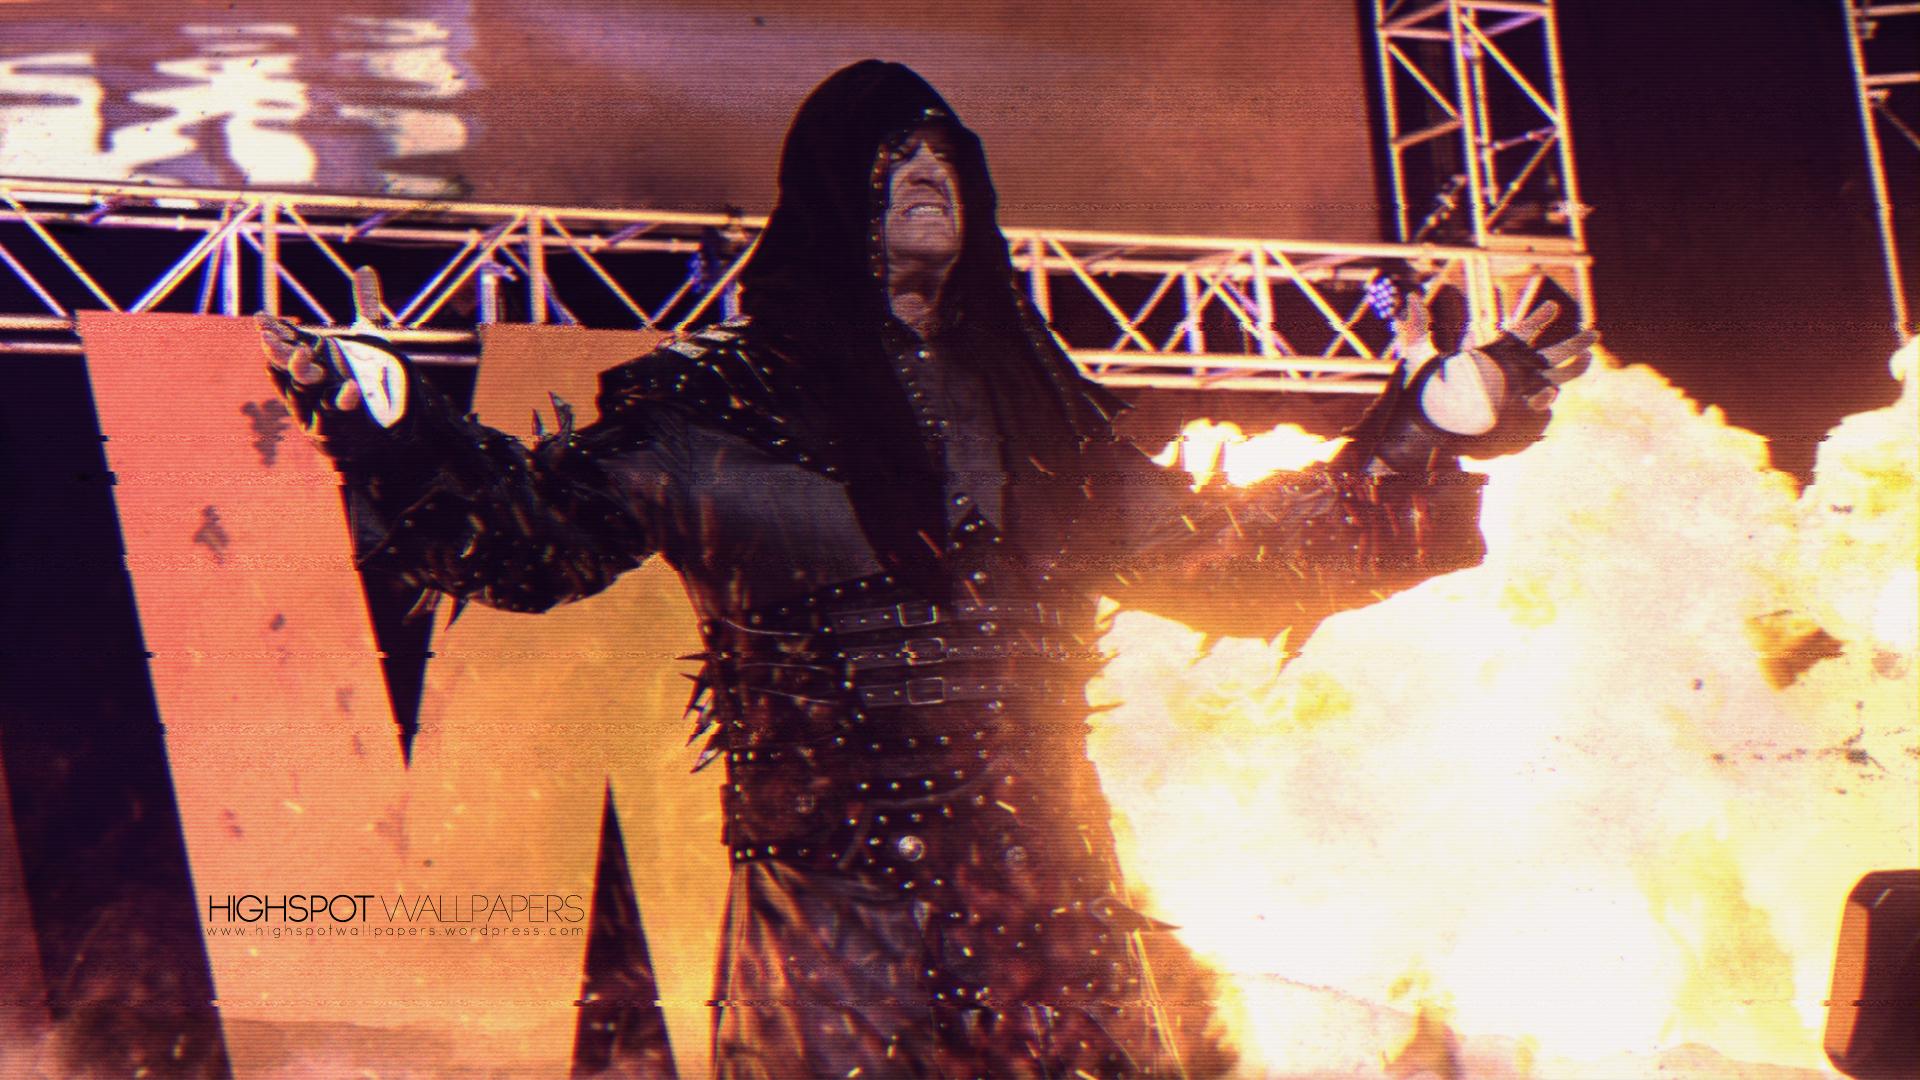 Batista Hd Wallpapers 2014 The Undertaker Wallpaper Highspot Wrestling Wallpapers